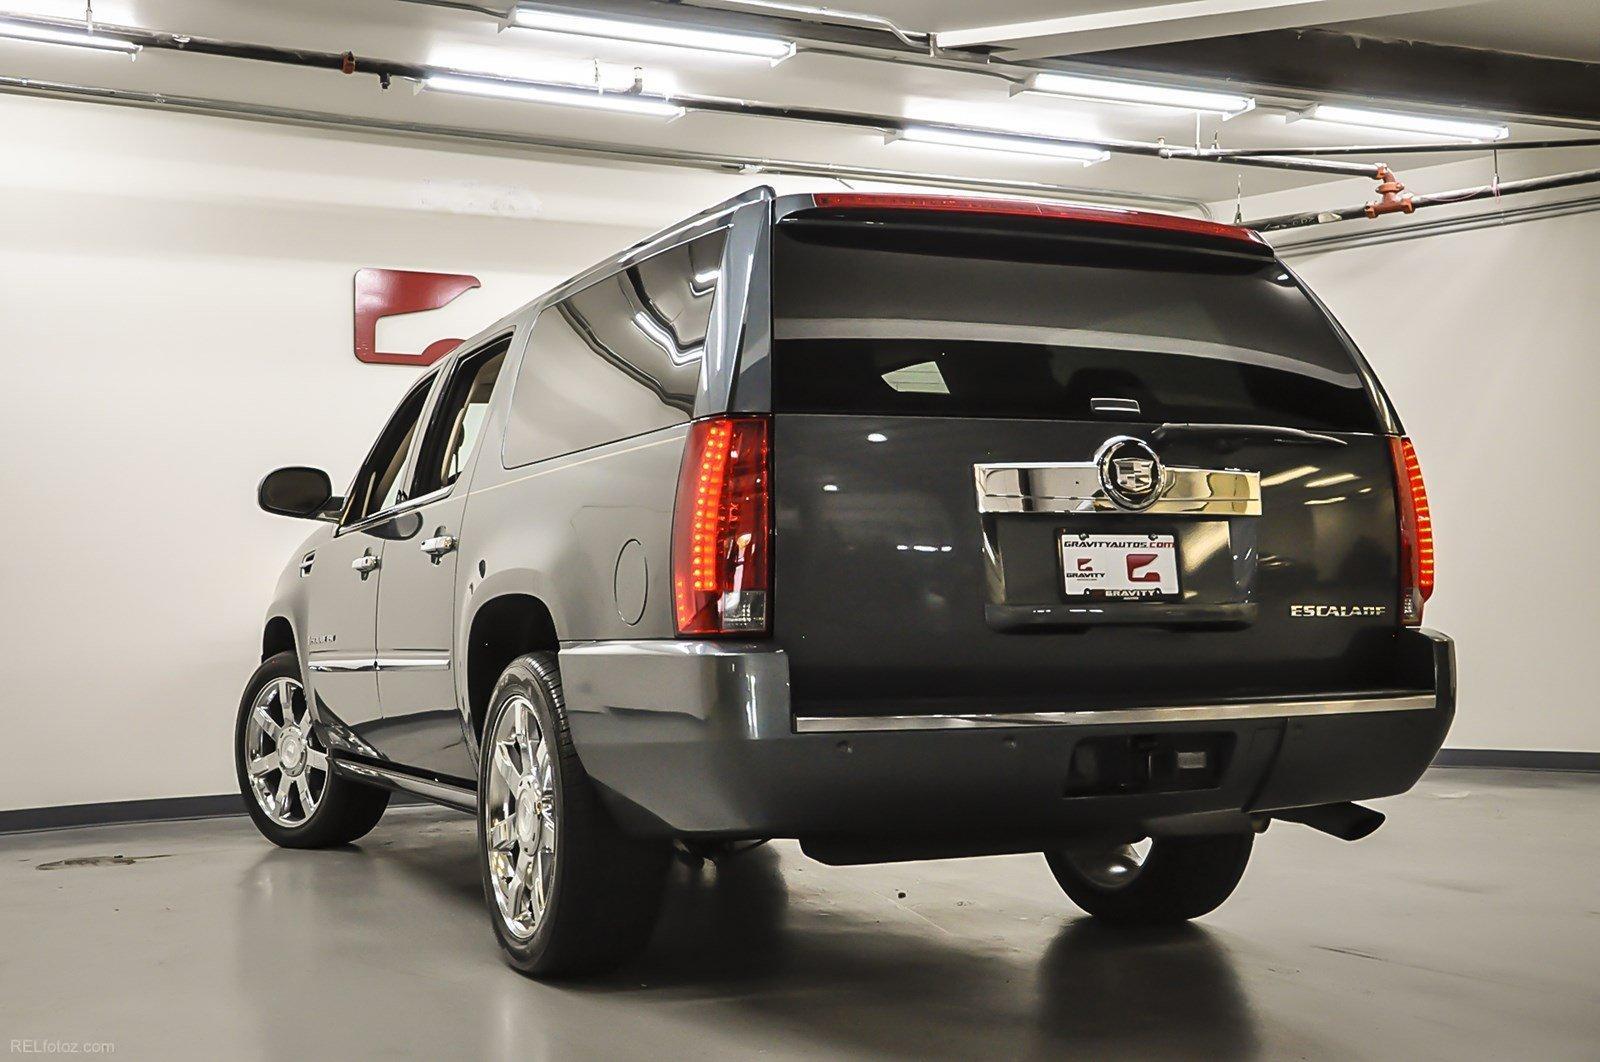 2008 Cadillac Escalade ESV Stock # 217059 For Sale Near